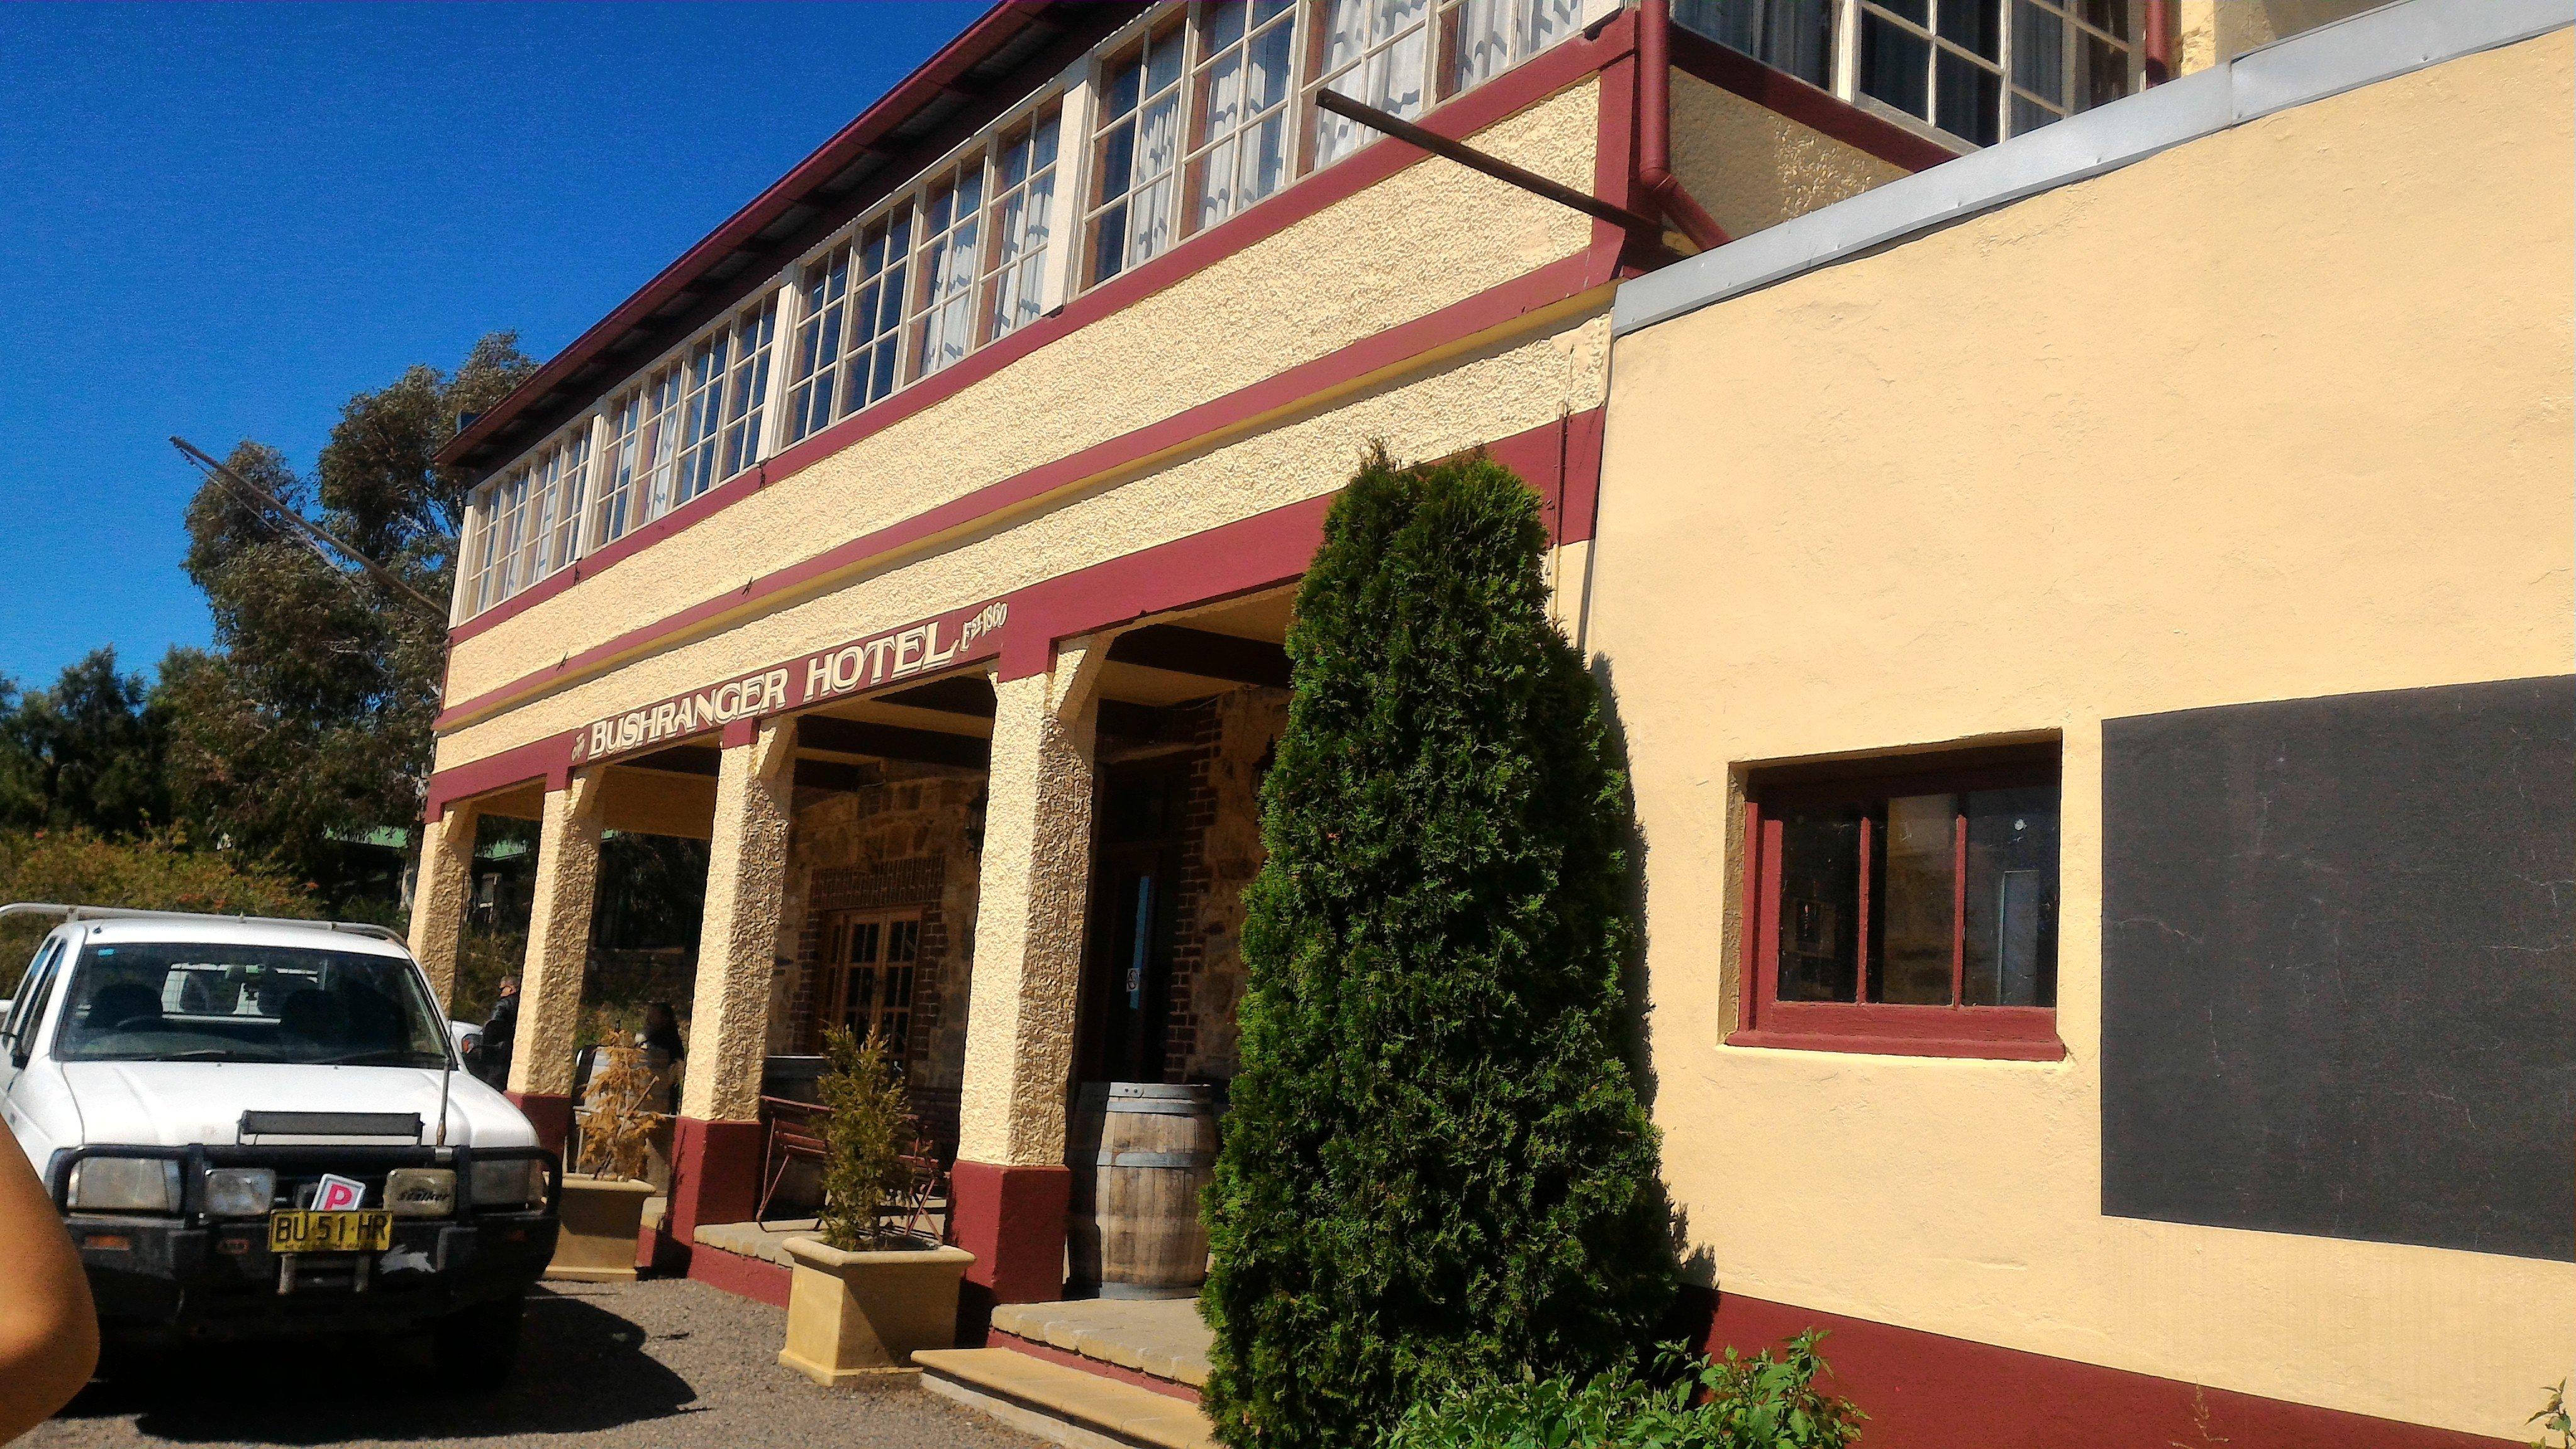 Bushranger Hotel